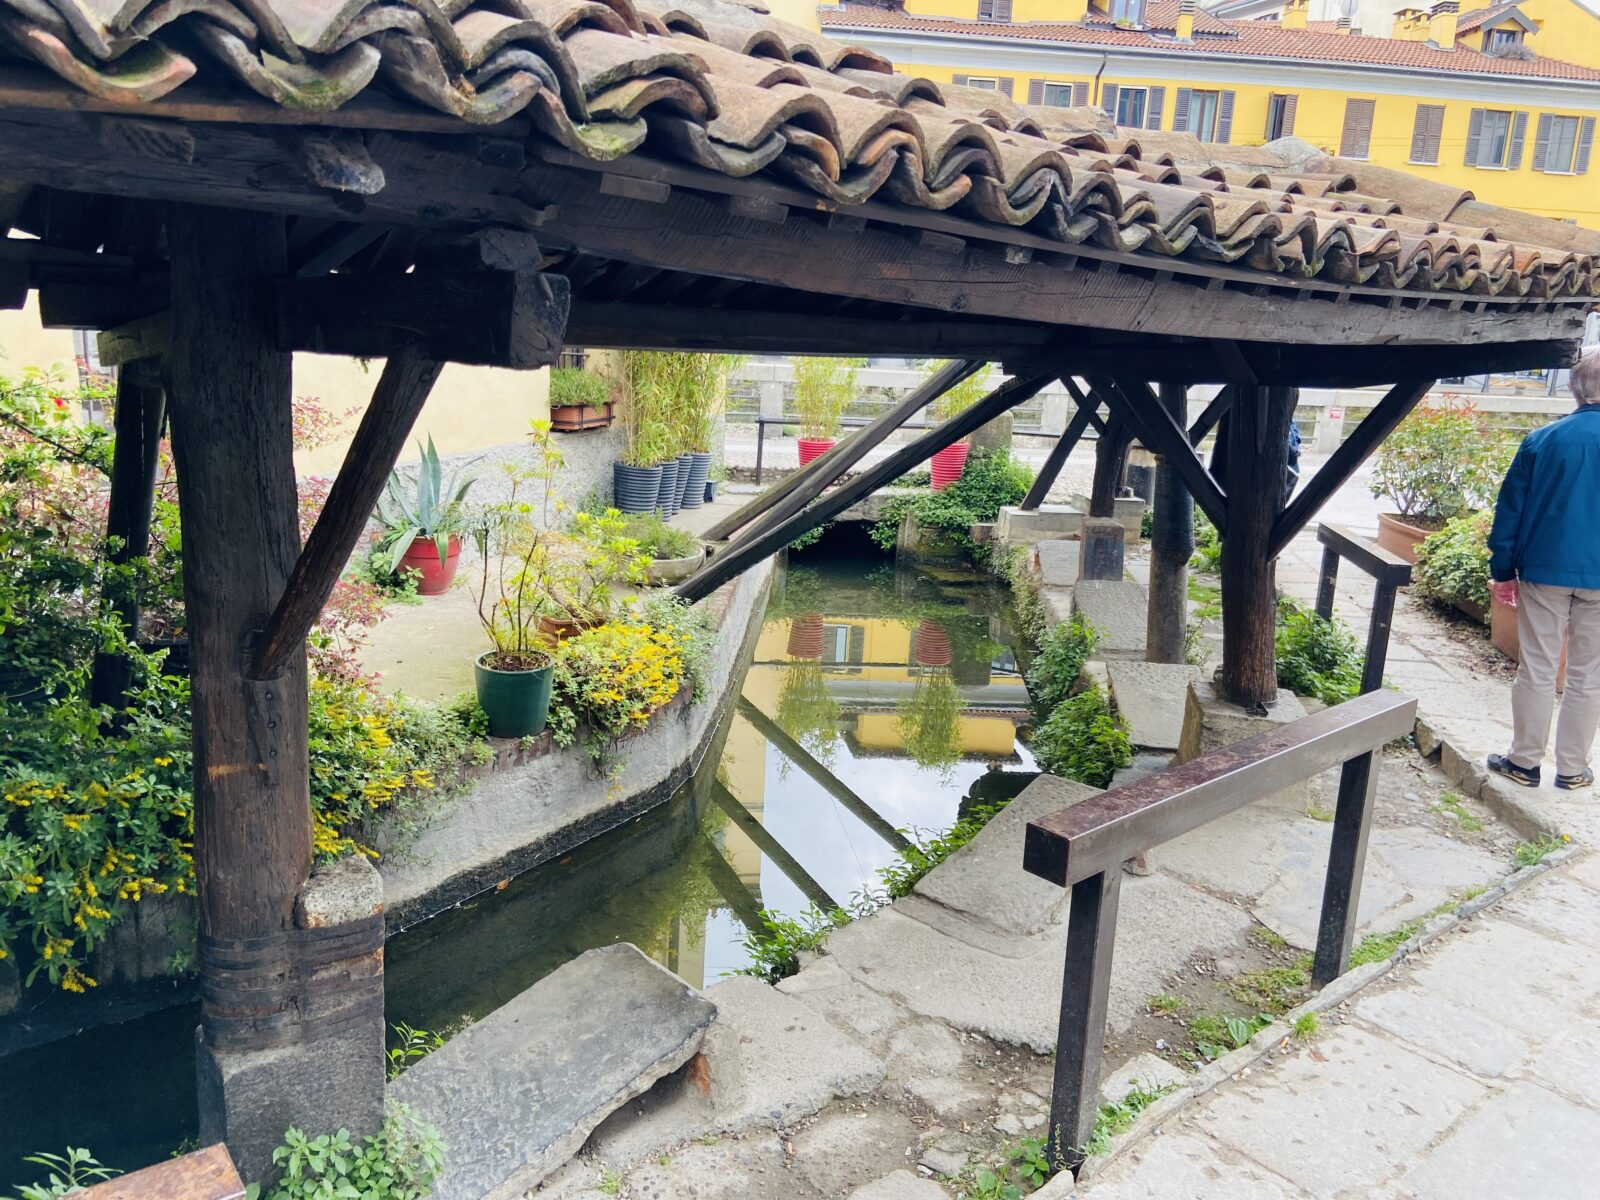 The mini canal on Via dei Lavandai.